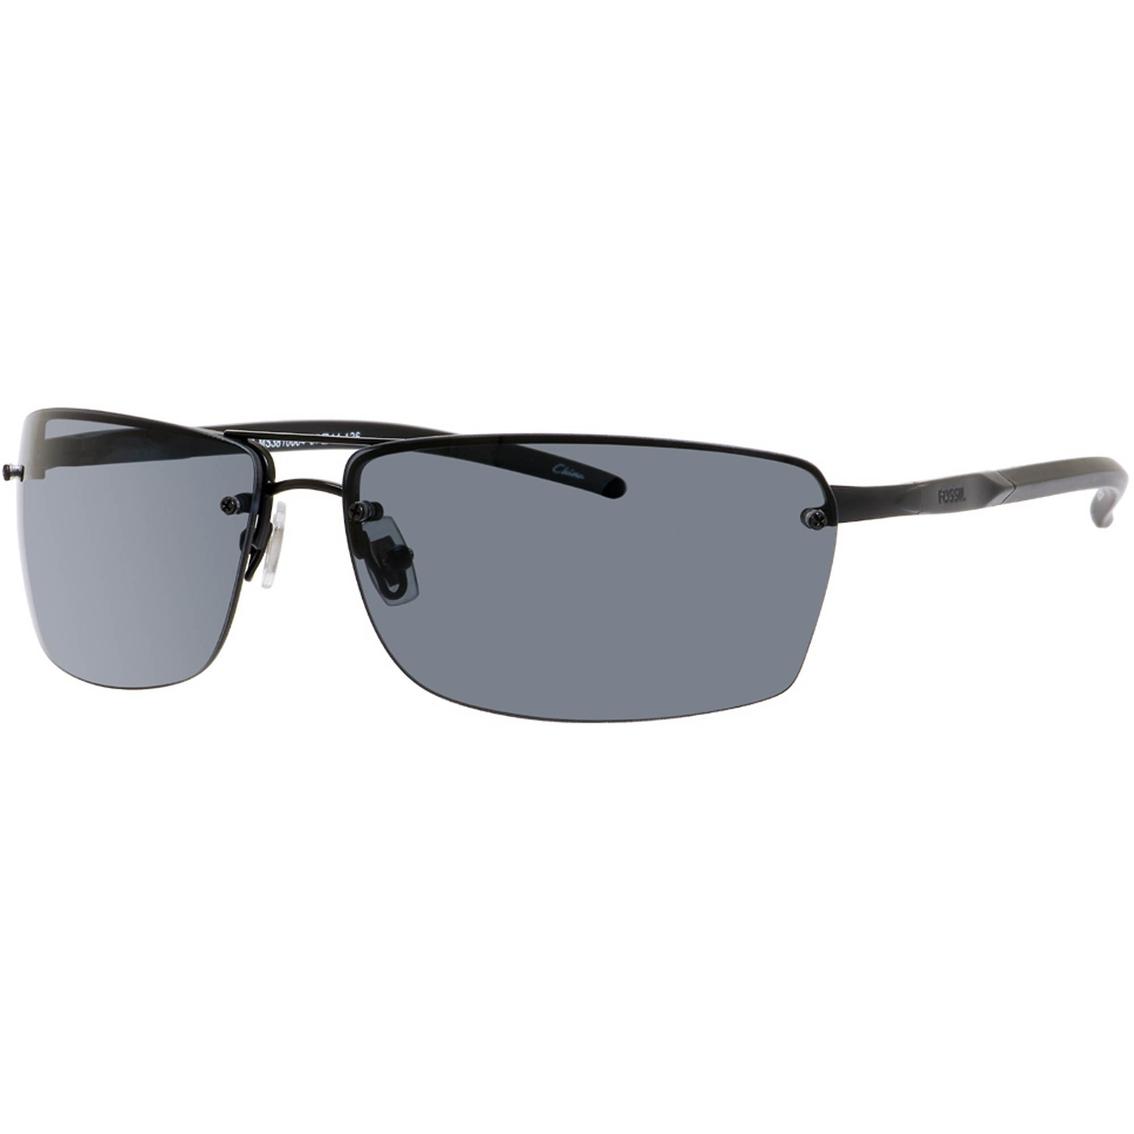 2f58c524ab Fossil Military Metal Rectangle Rimless Polarized Sunglasses 27 s ...